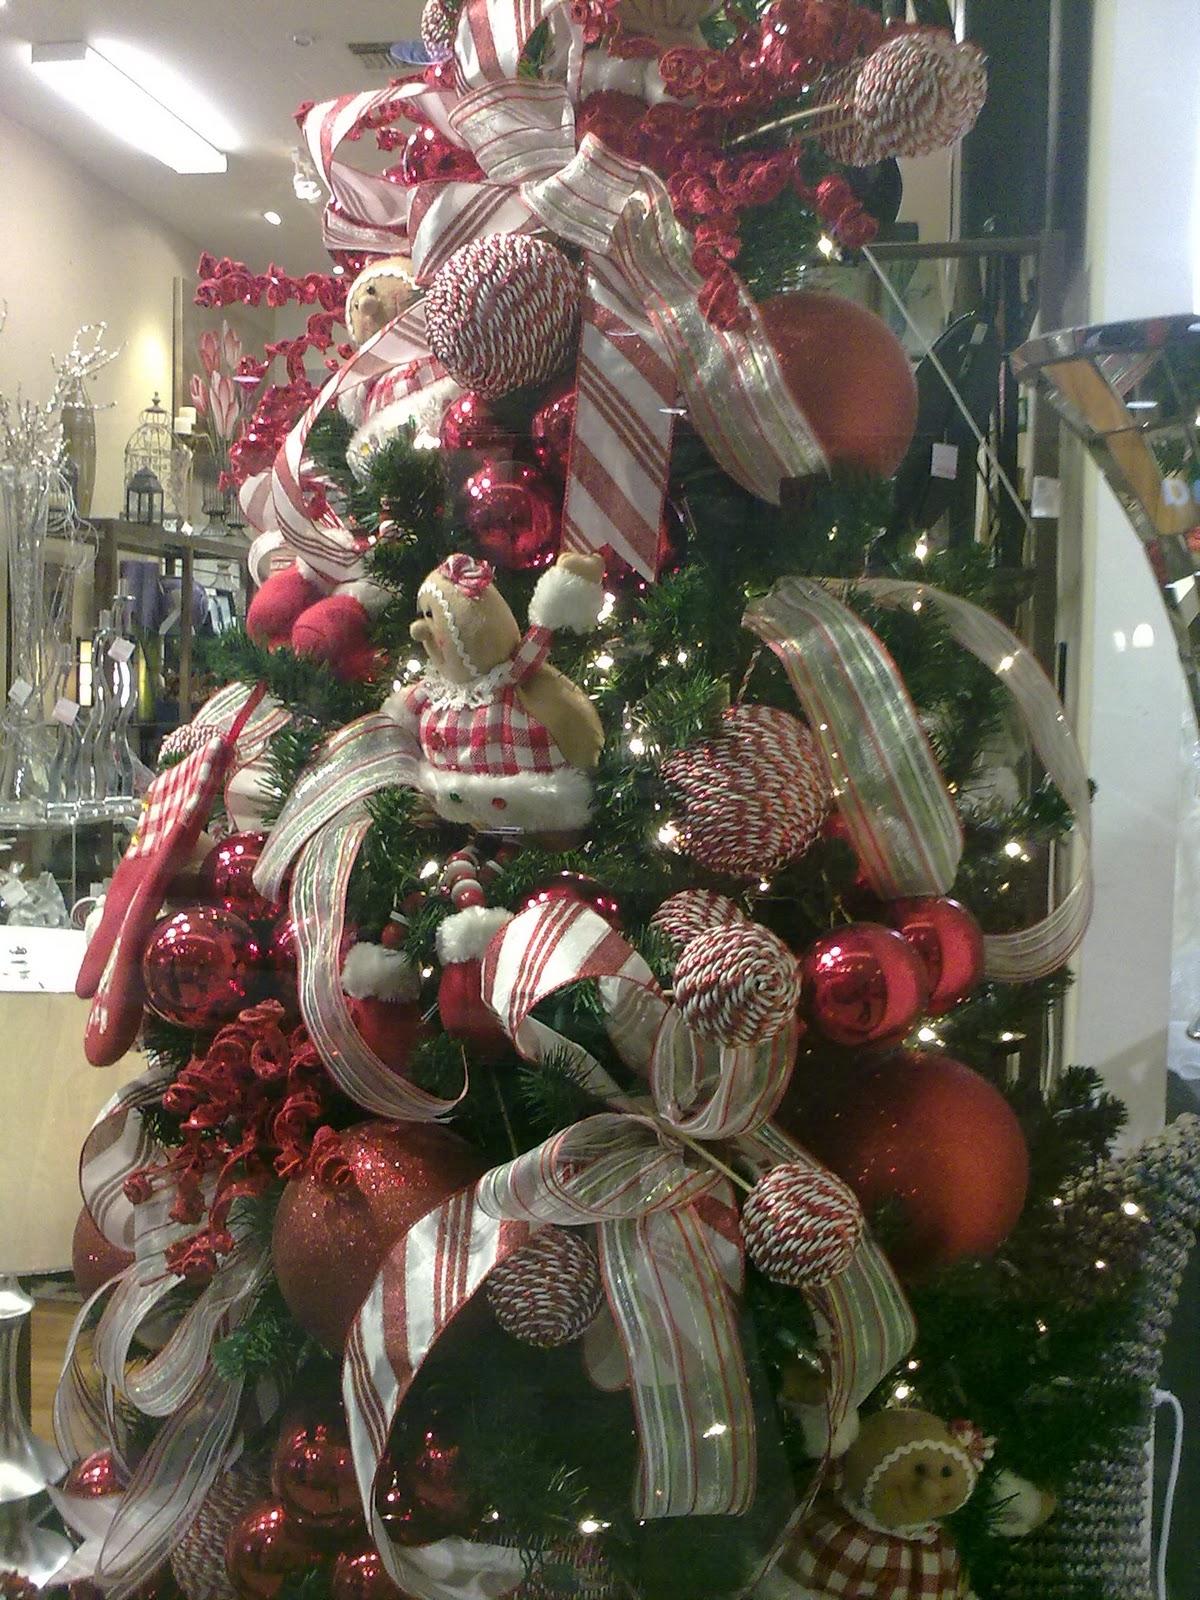 Living my 40s and more mas fotos de decoracion navide a 2011 - Decoracion arbol navideno ...